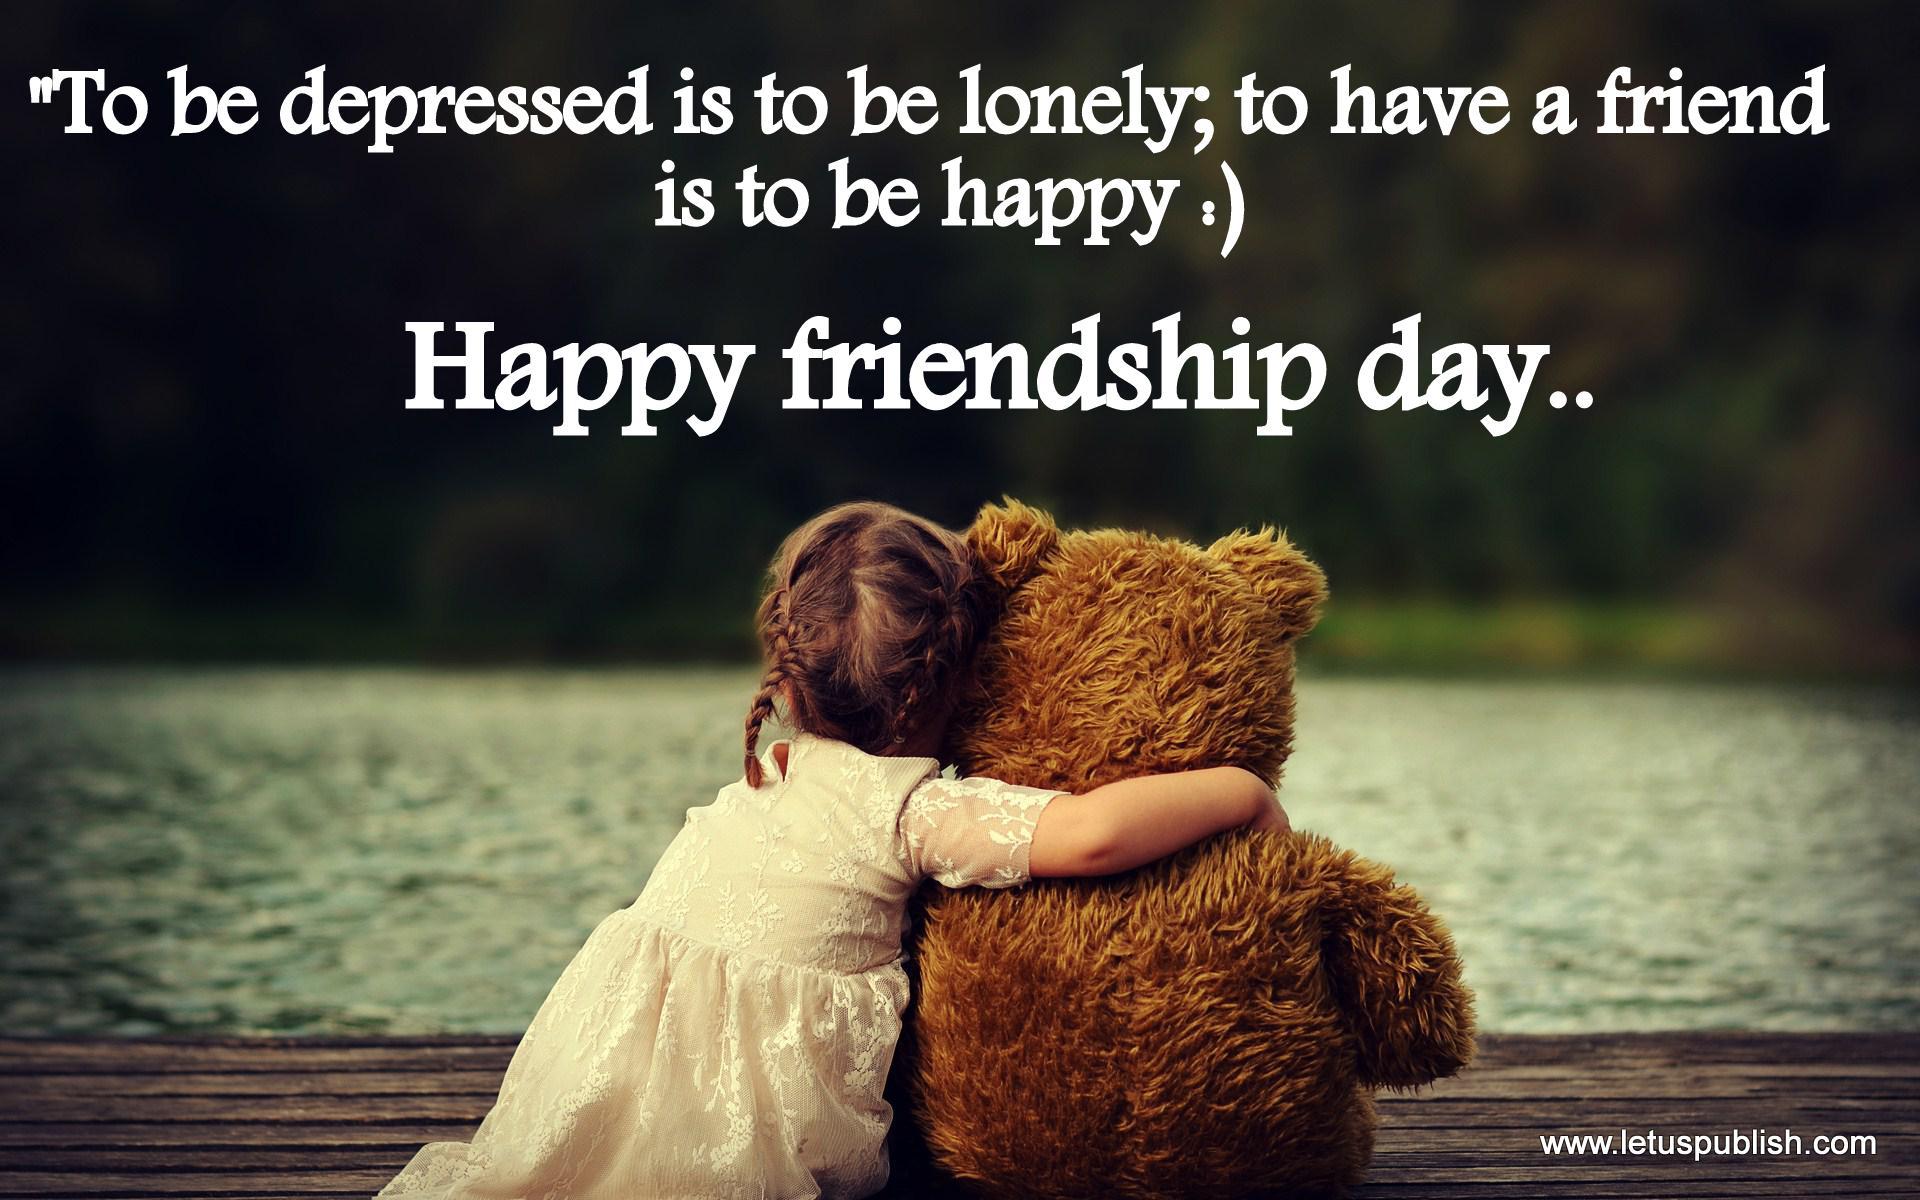 Happy friendship day wallpaper download